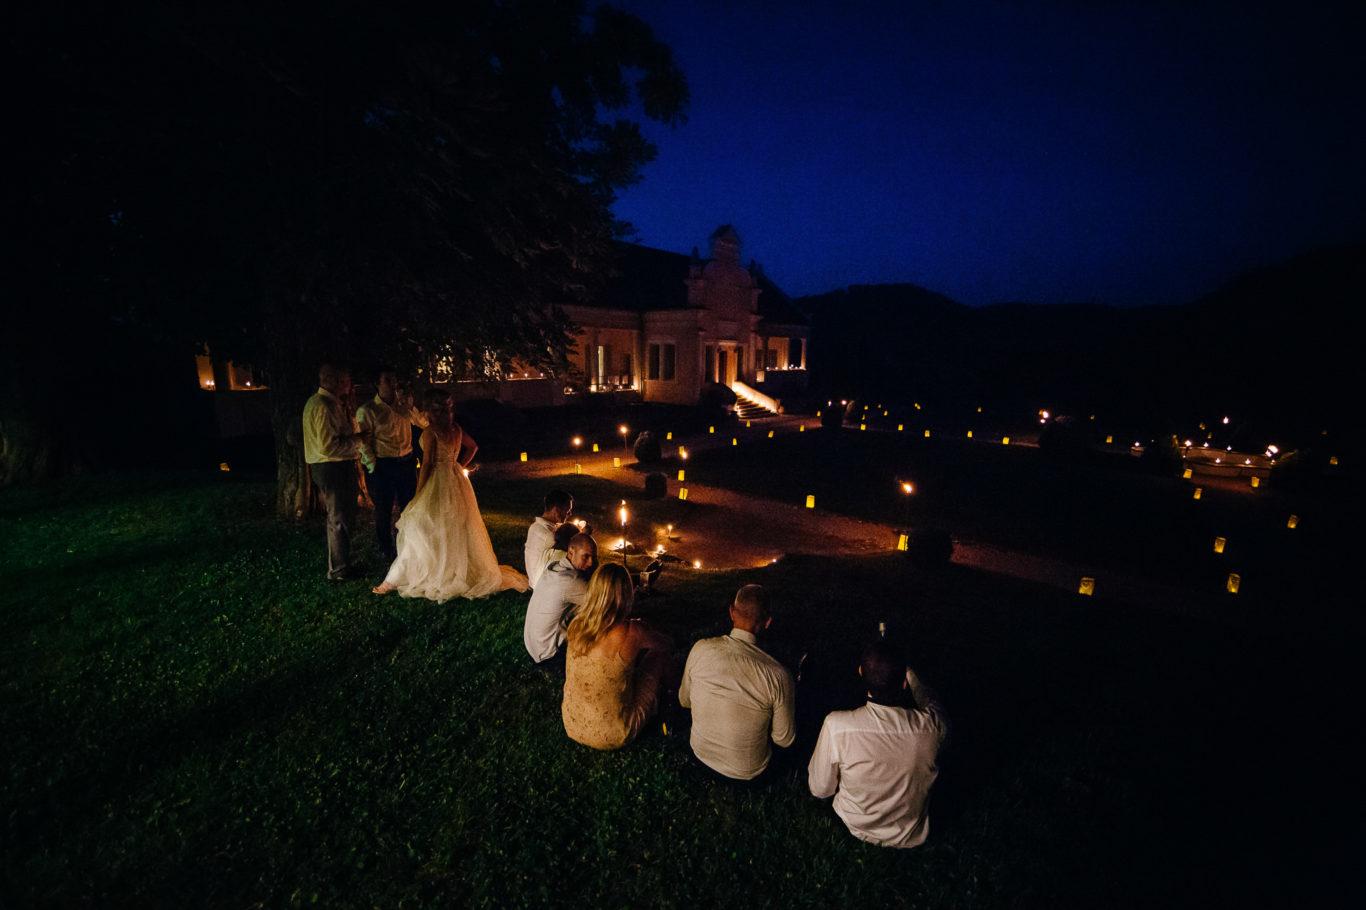 0633-fotografie-nunta-conacul-apafi-ana-simion-fotograf-ciprian-dumitrescu-cd2_1107